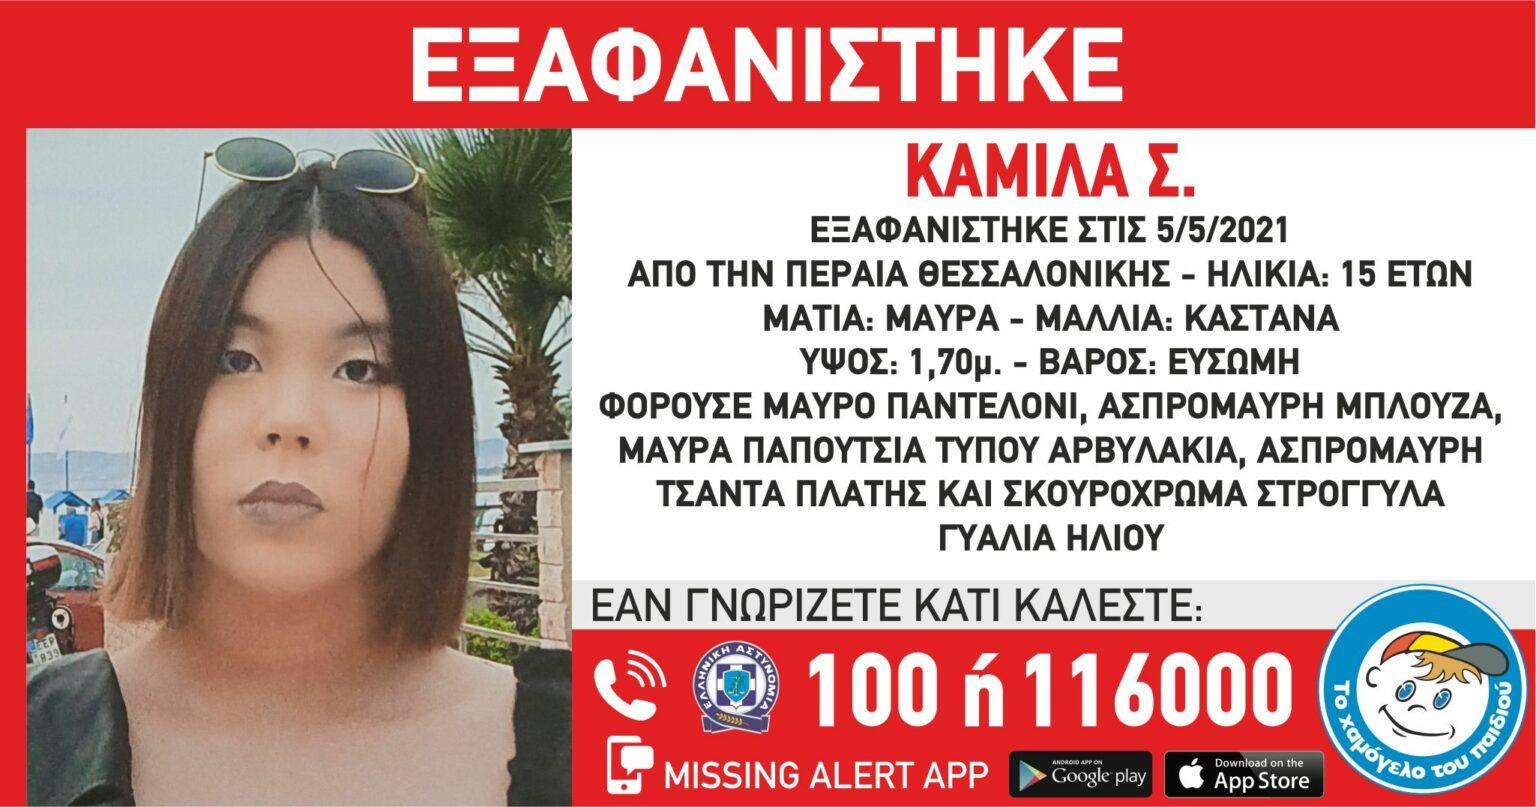 Missing Alert για την Καμίλα